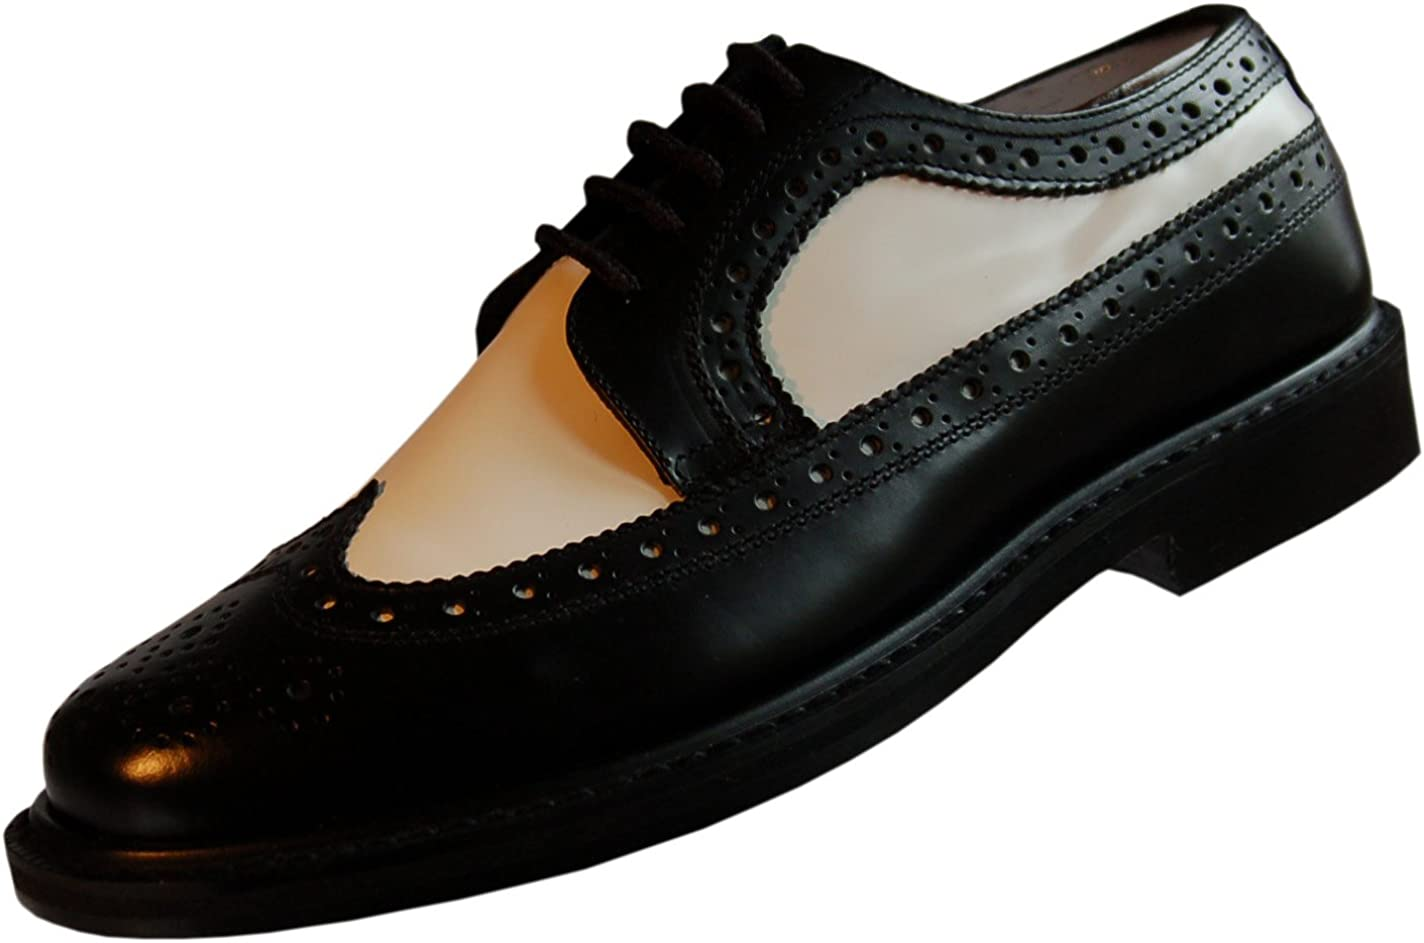 Emanuel Two Tone Loafer Black /& White Belvedere